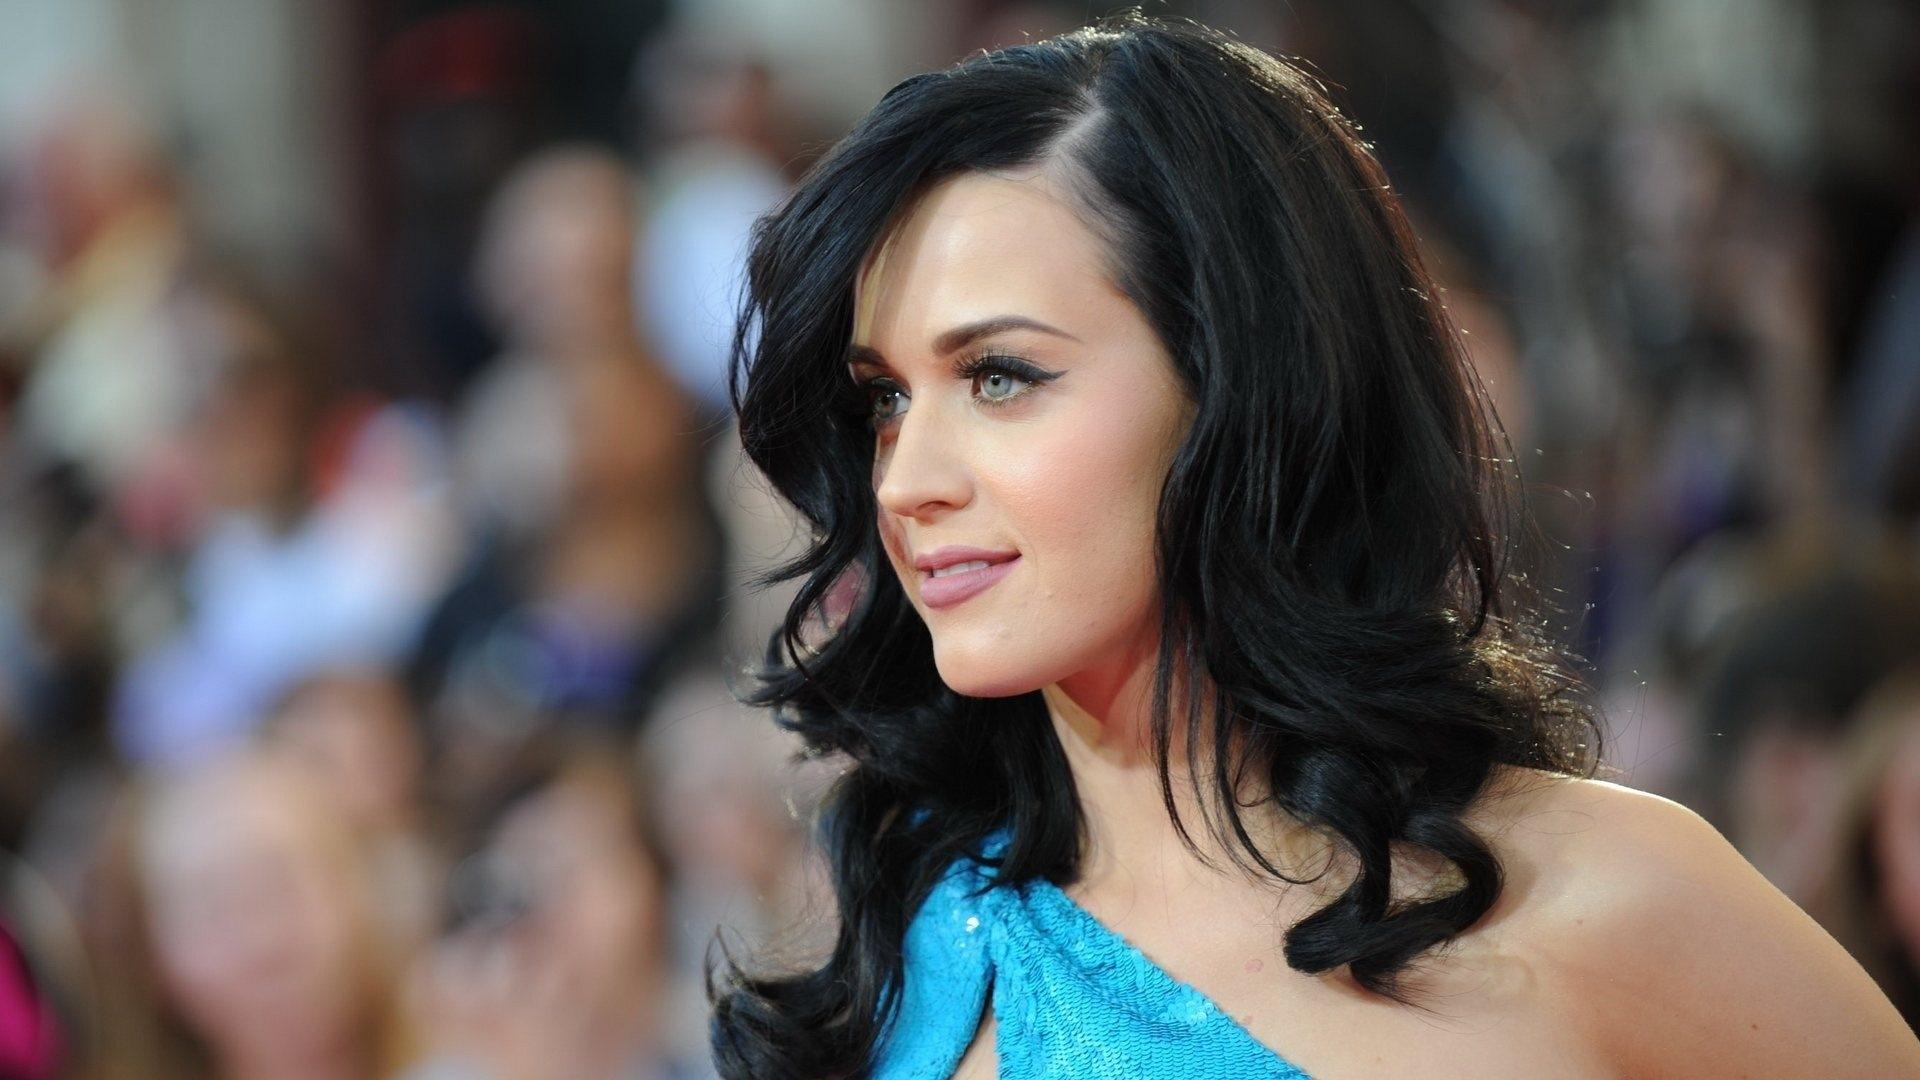 Wallpaper Long Hair Dress Black Hair Katy Perry Supermodel